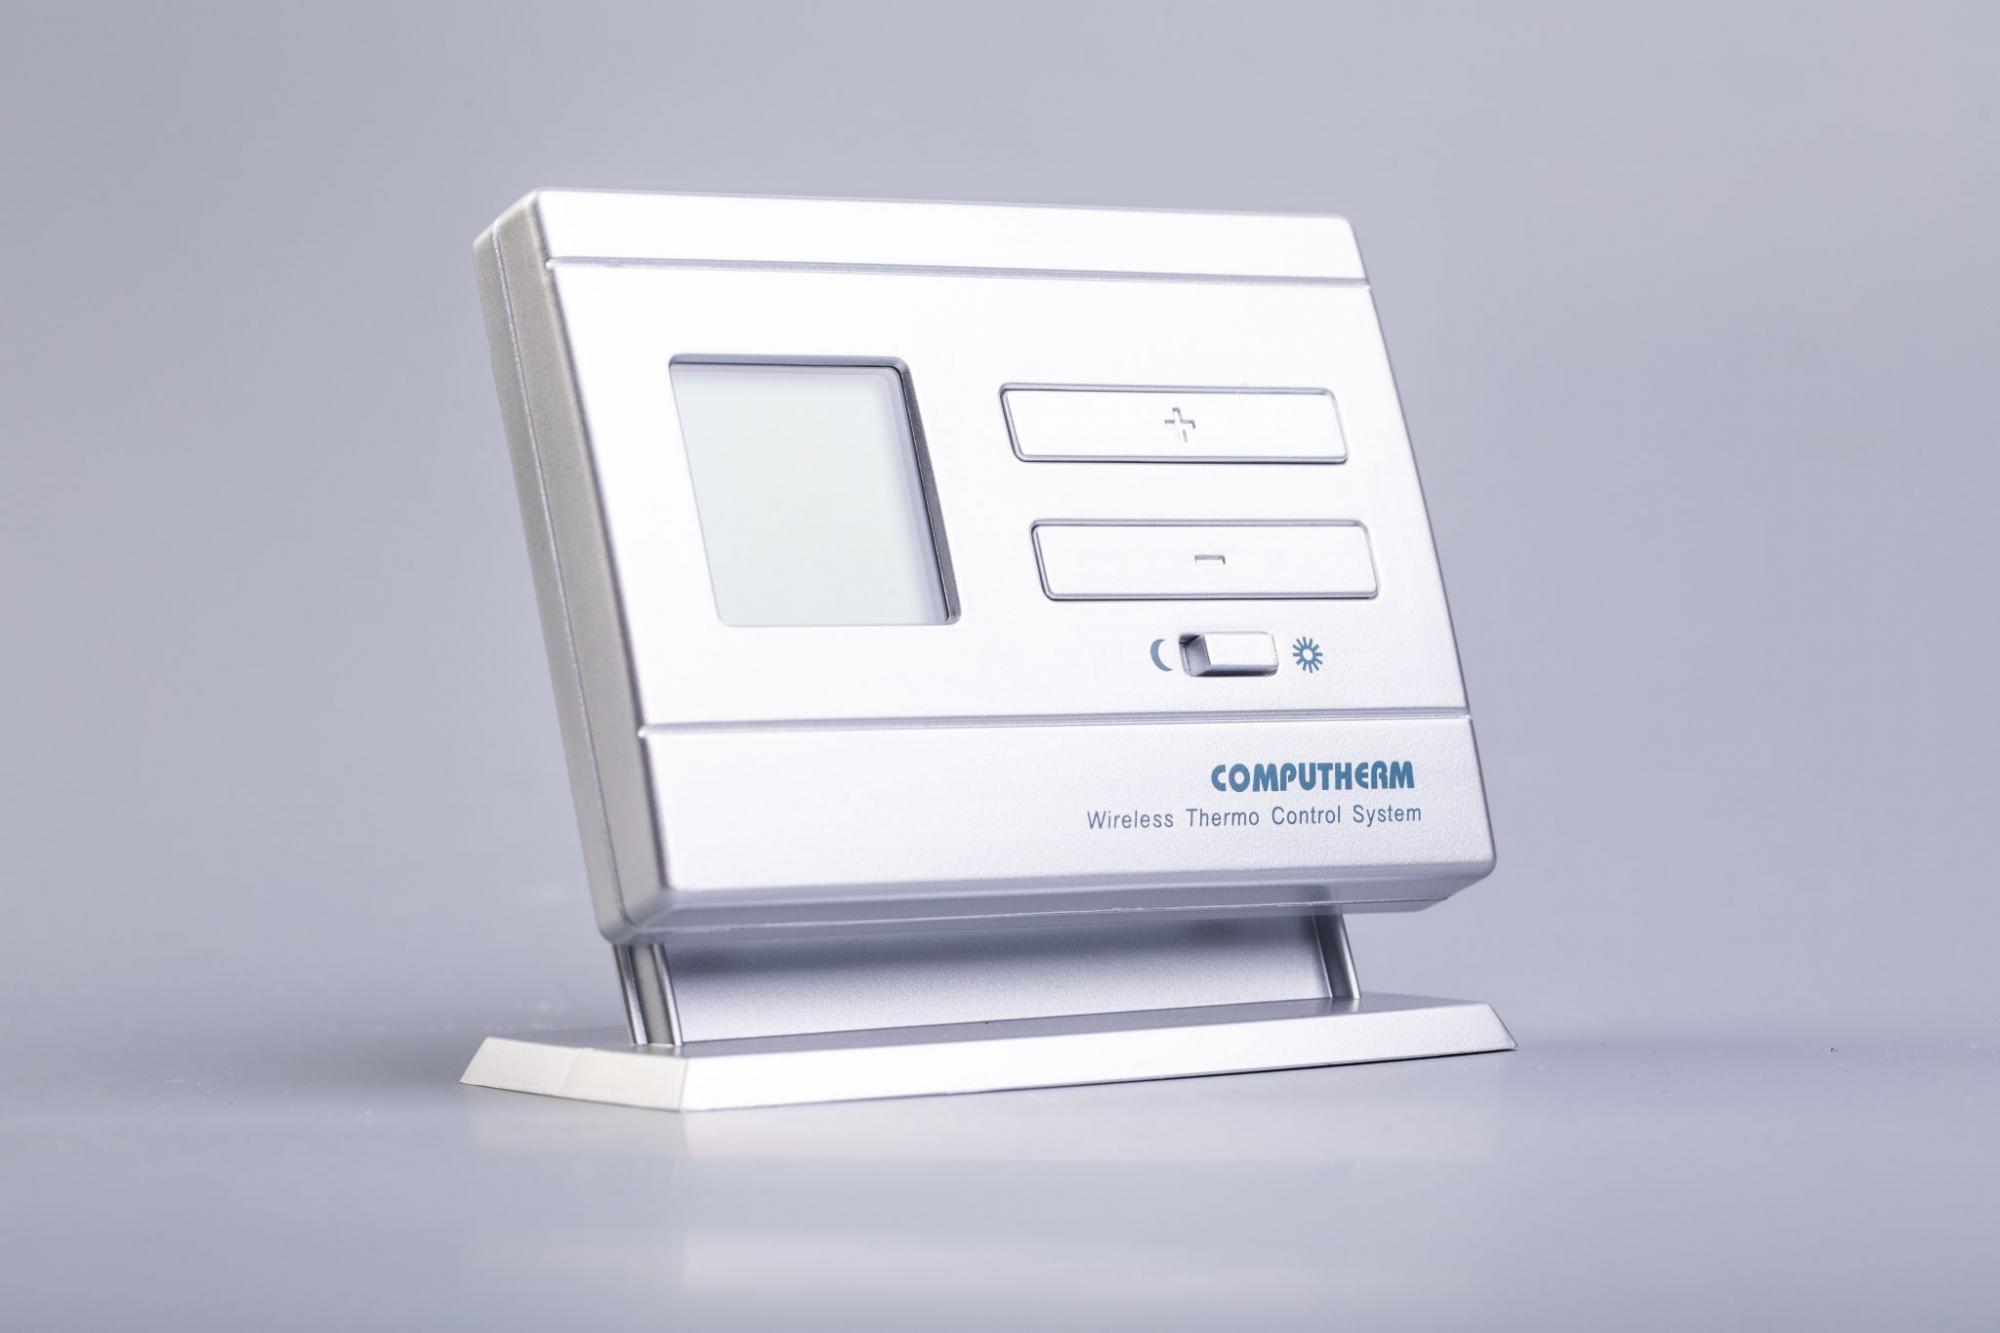 Computherm - Digitális termosztátok - COMPUTHERM Q5RF - Quantrax Kft.